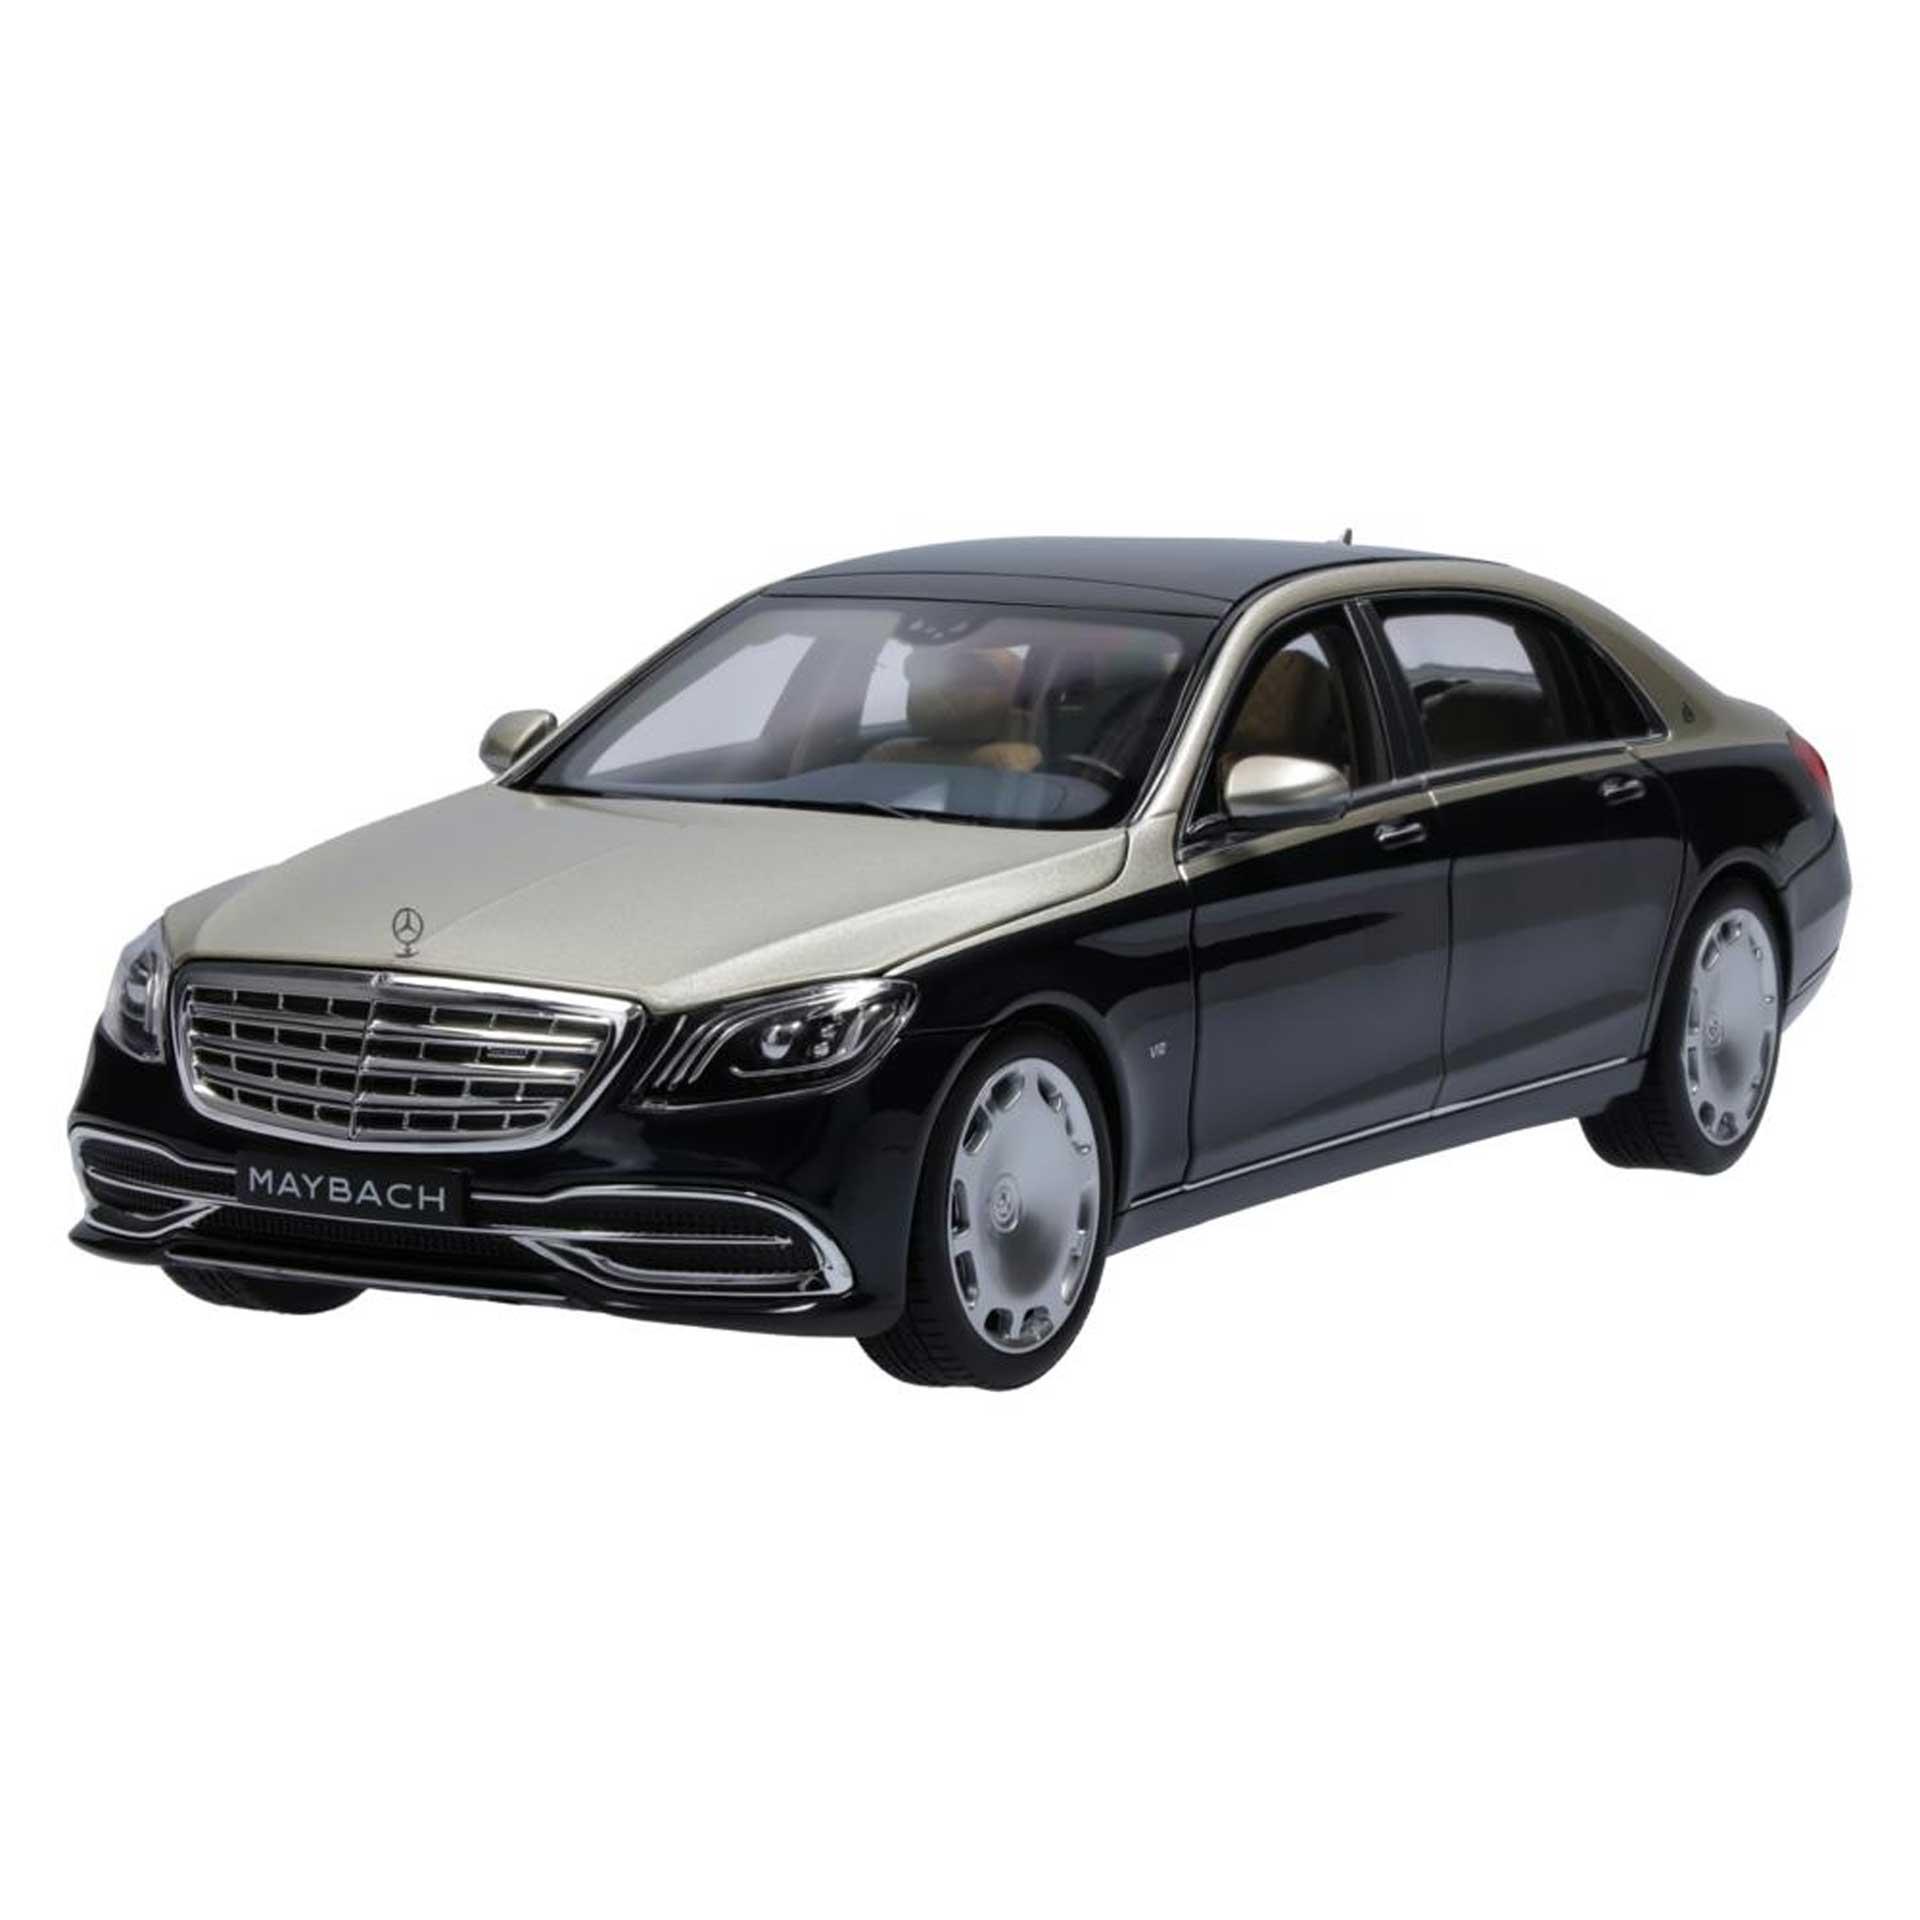 Mercedes-Maybach Modellauto S 650 X222 1:18 aragonitsilber anthrazitblau